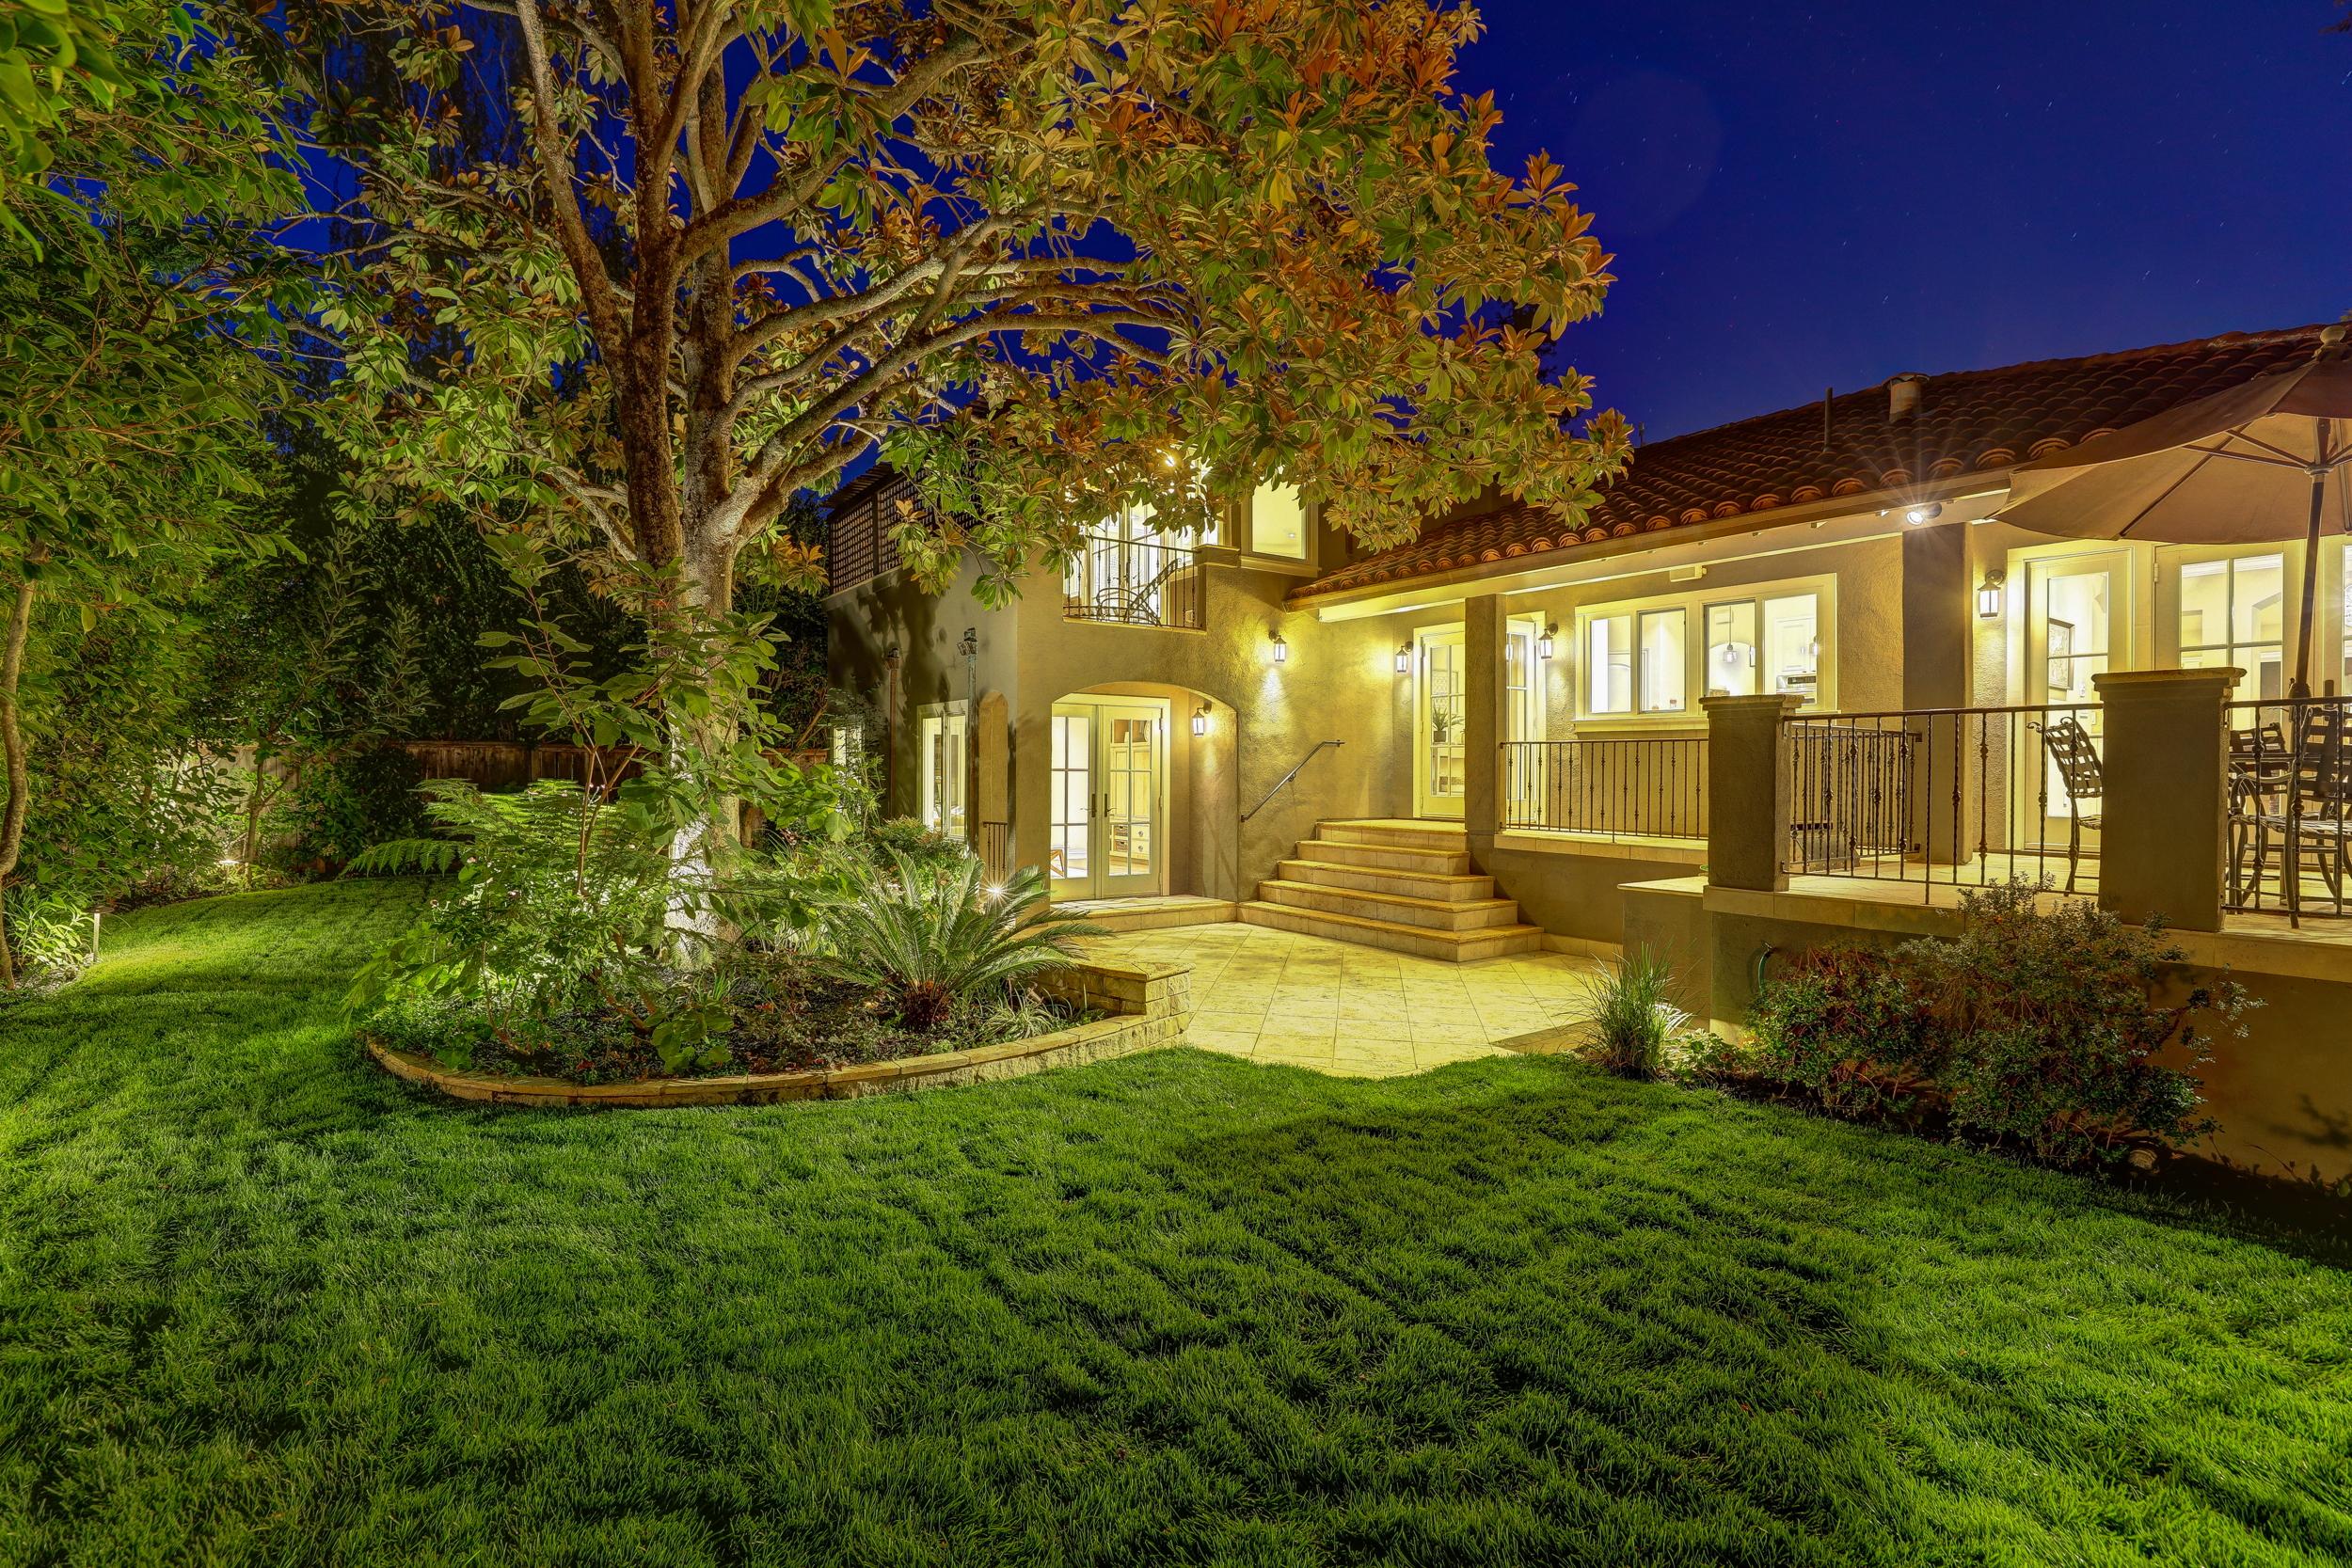 33 Laurel Grove, Kentfield Realtor13 - Own Marin with Compass - Marin County Realtor.jpg